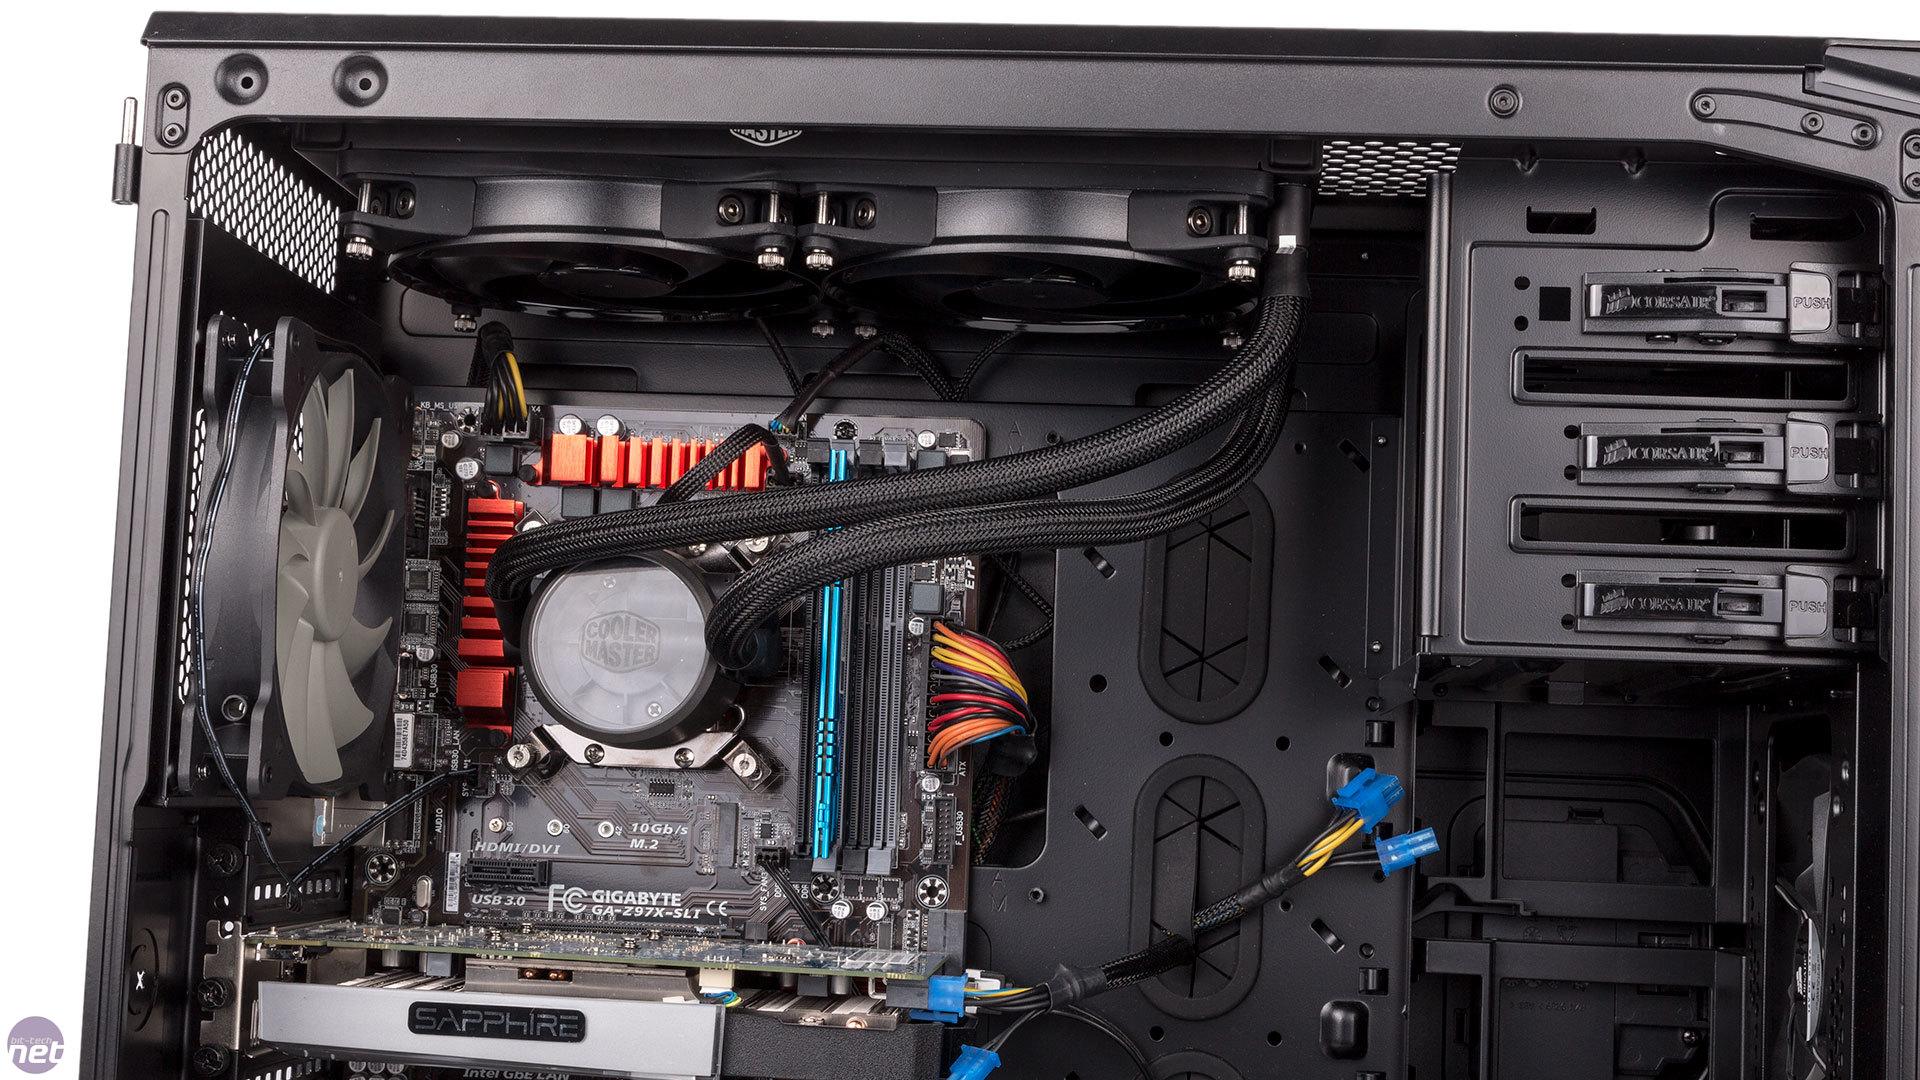 Cooler Master Masterliquid Pro 280 Review